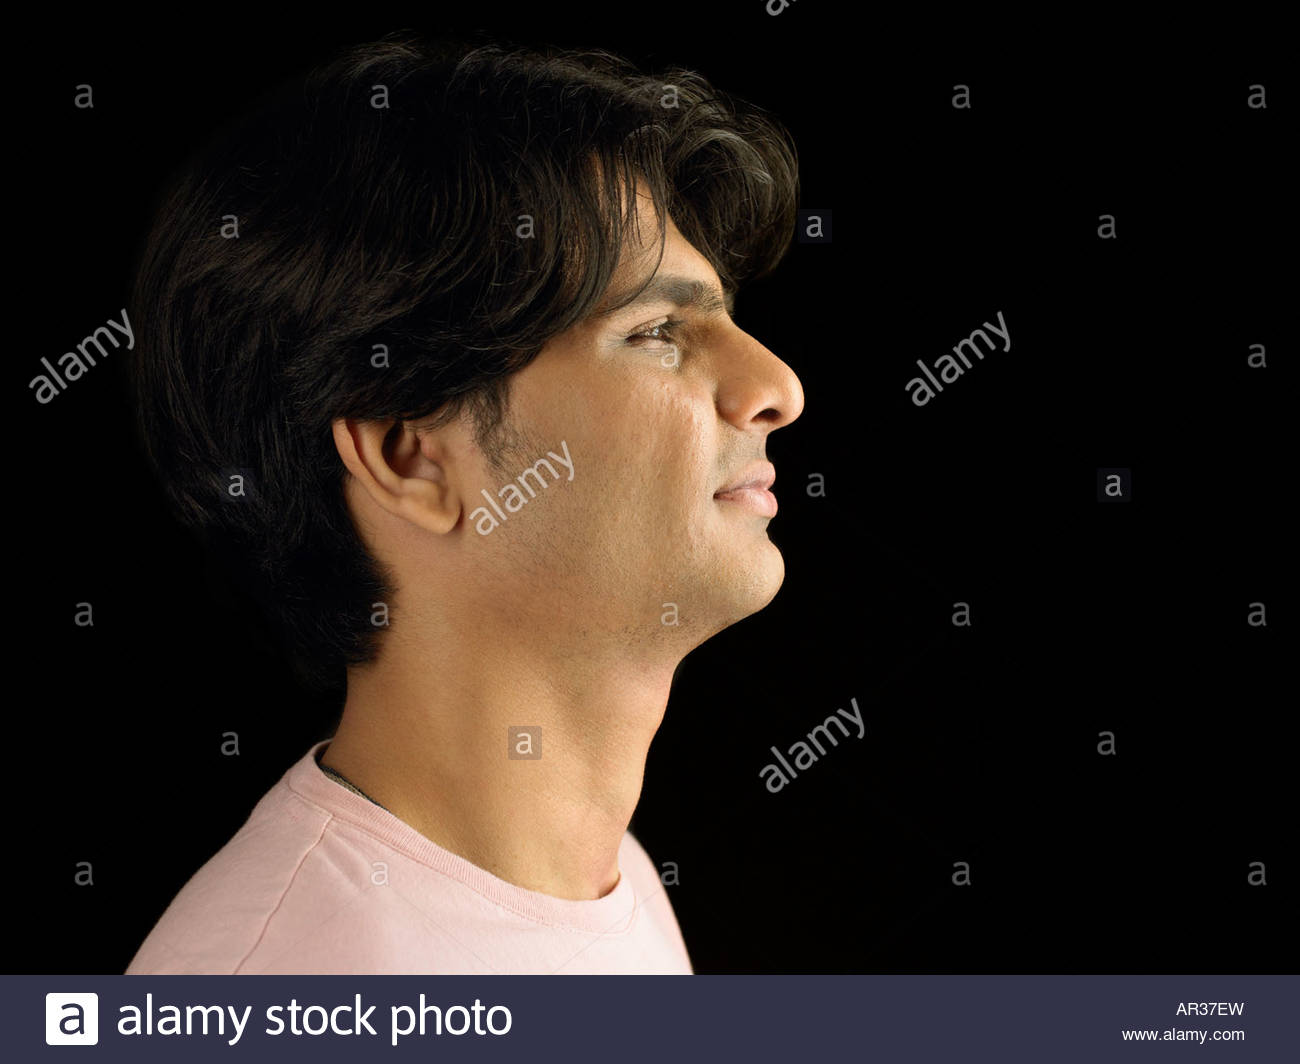 Man grimacing - Stock Image